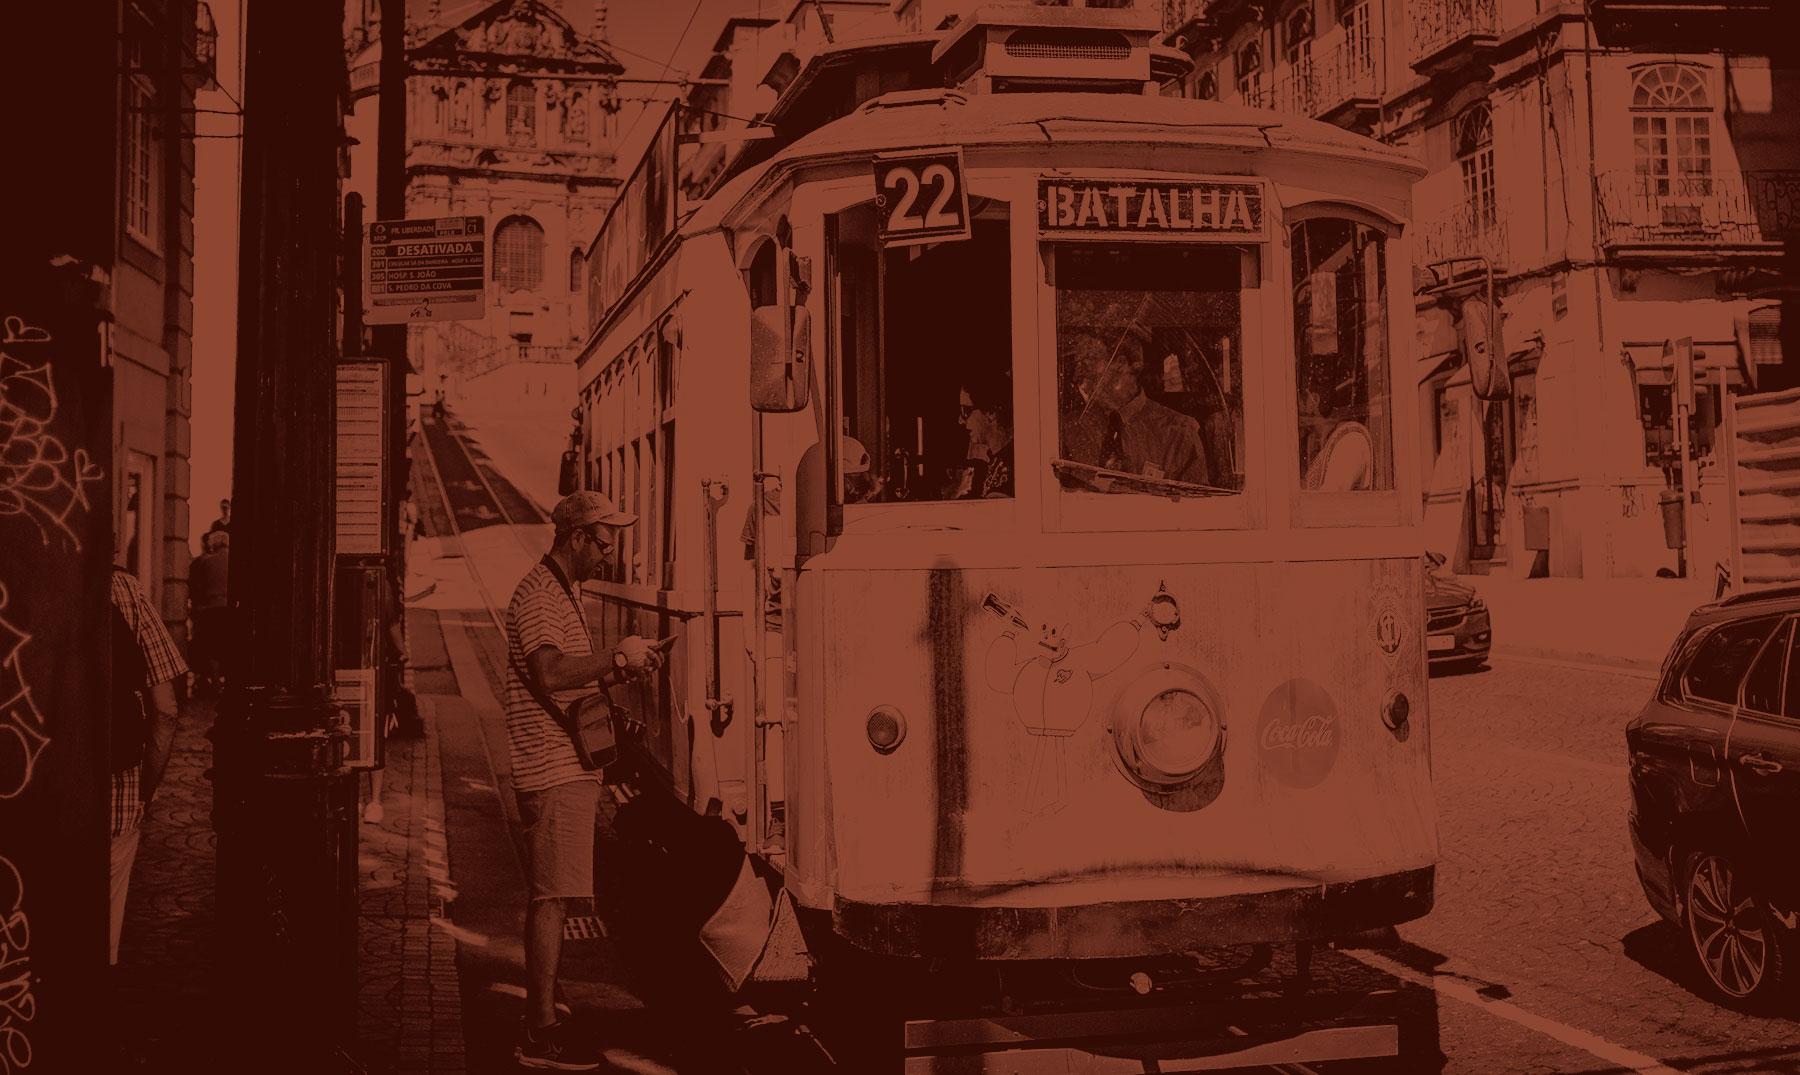 http://www.bethelanguage.com/wp-content/uploads/2018/08/Background-Portuguese-Be-The-Language.jpg